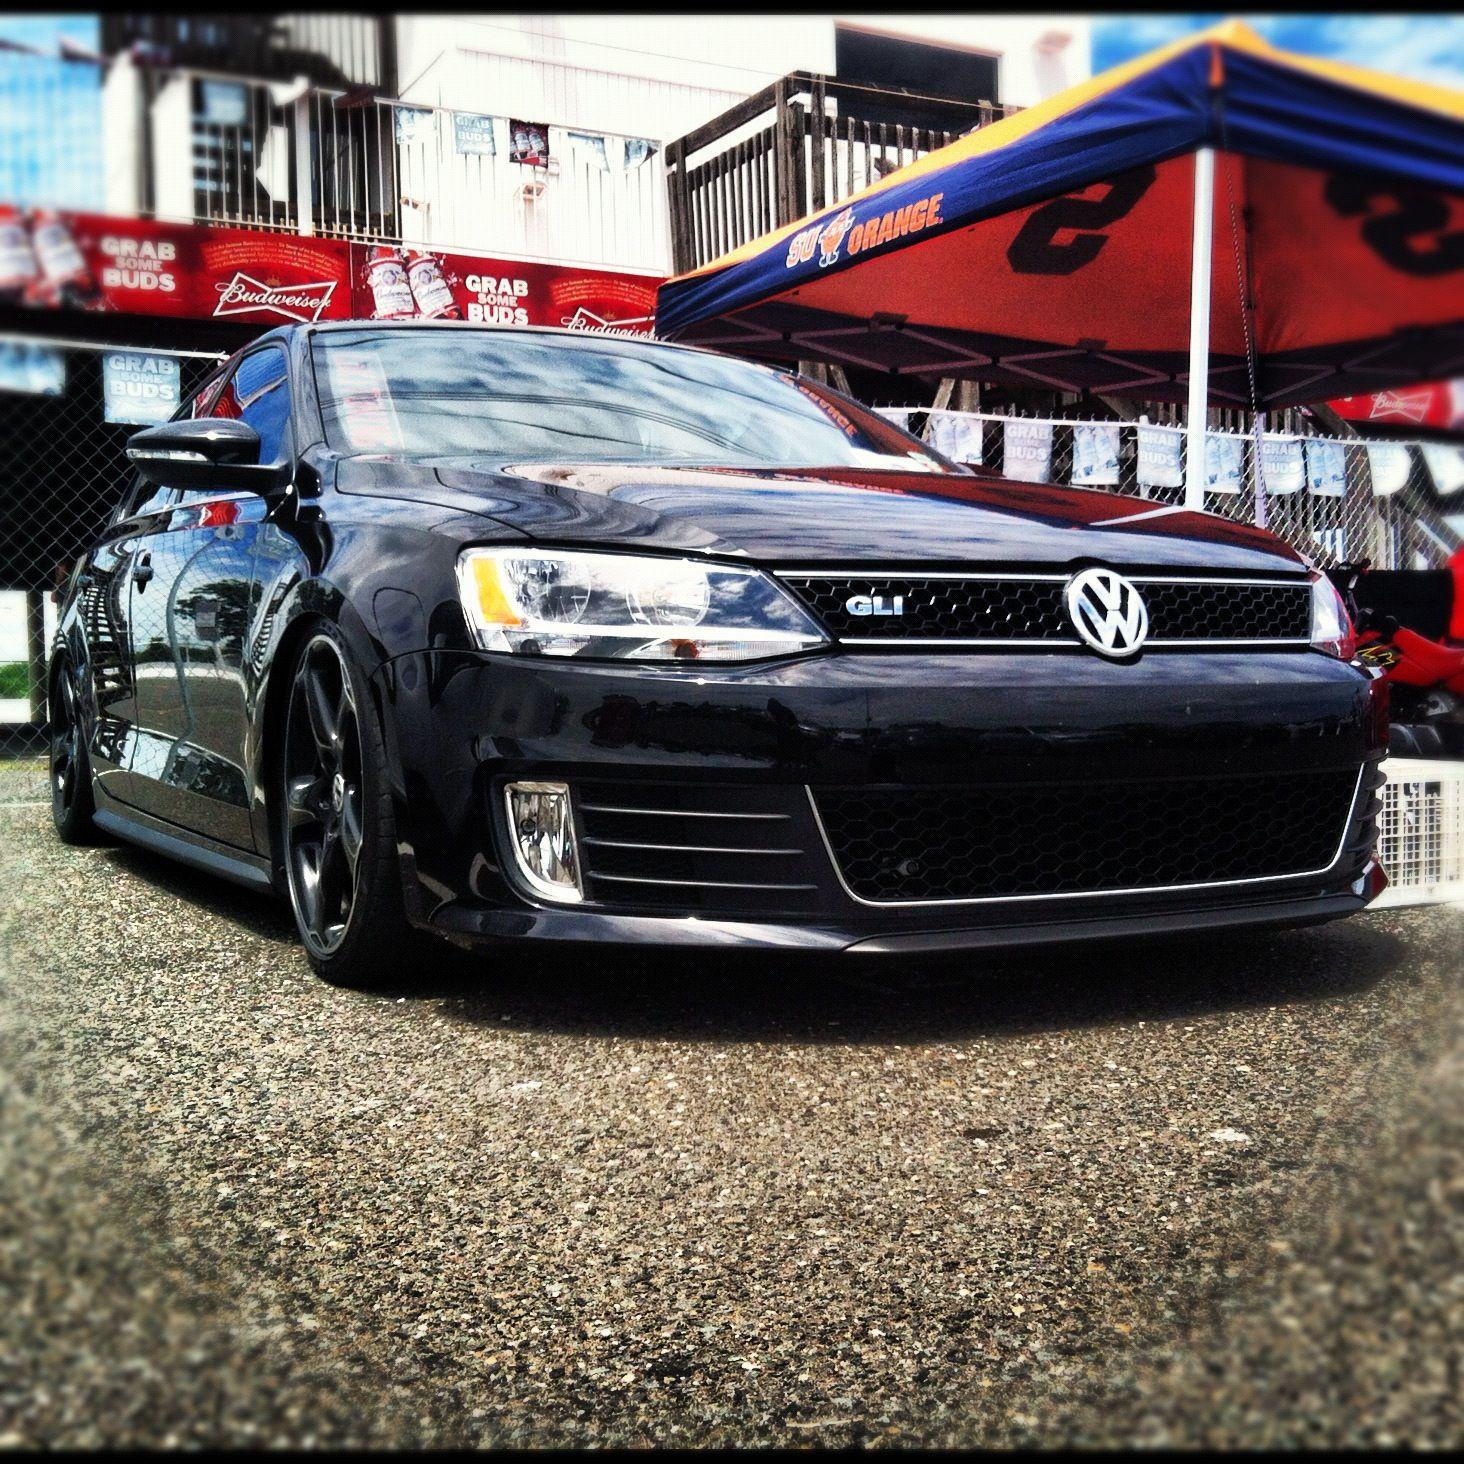 Volkswagen Jetta Price In Usa: VW GLI At 2012 #Waterfest